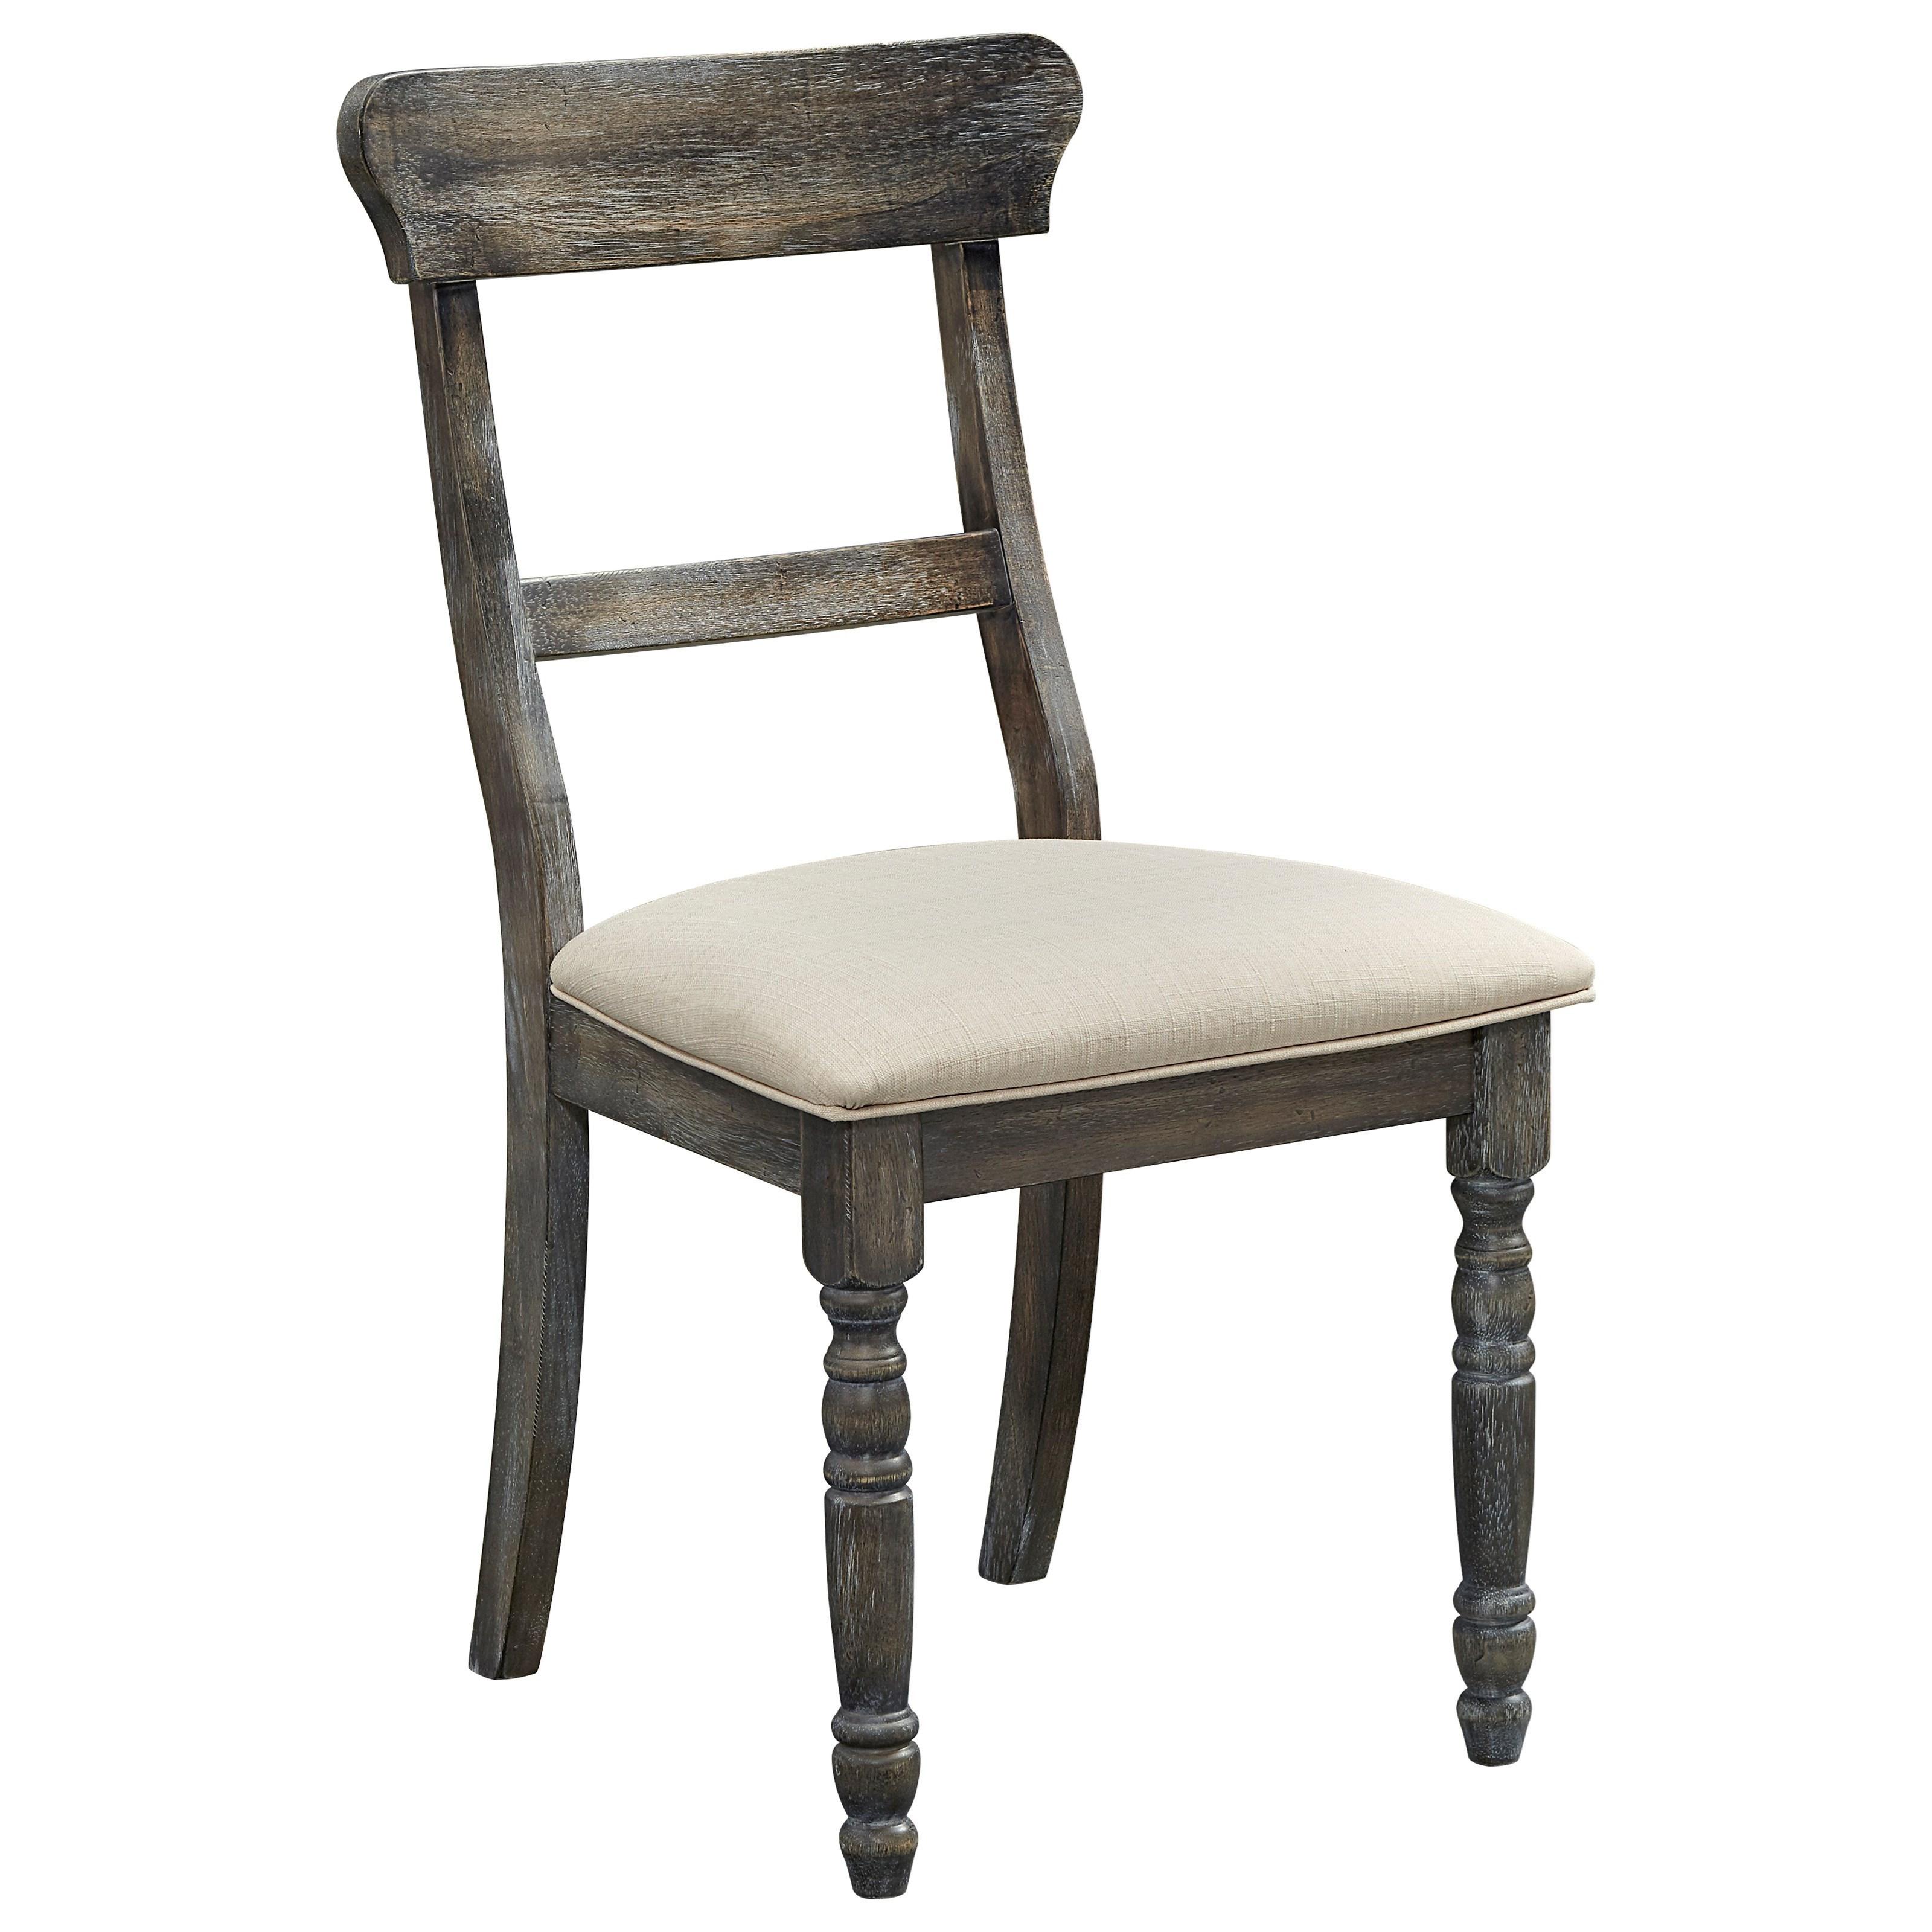 Progressive Furniture Muses Ladderback Chair   Item Number: P836 61